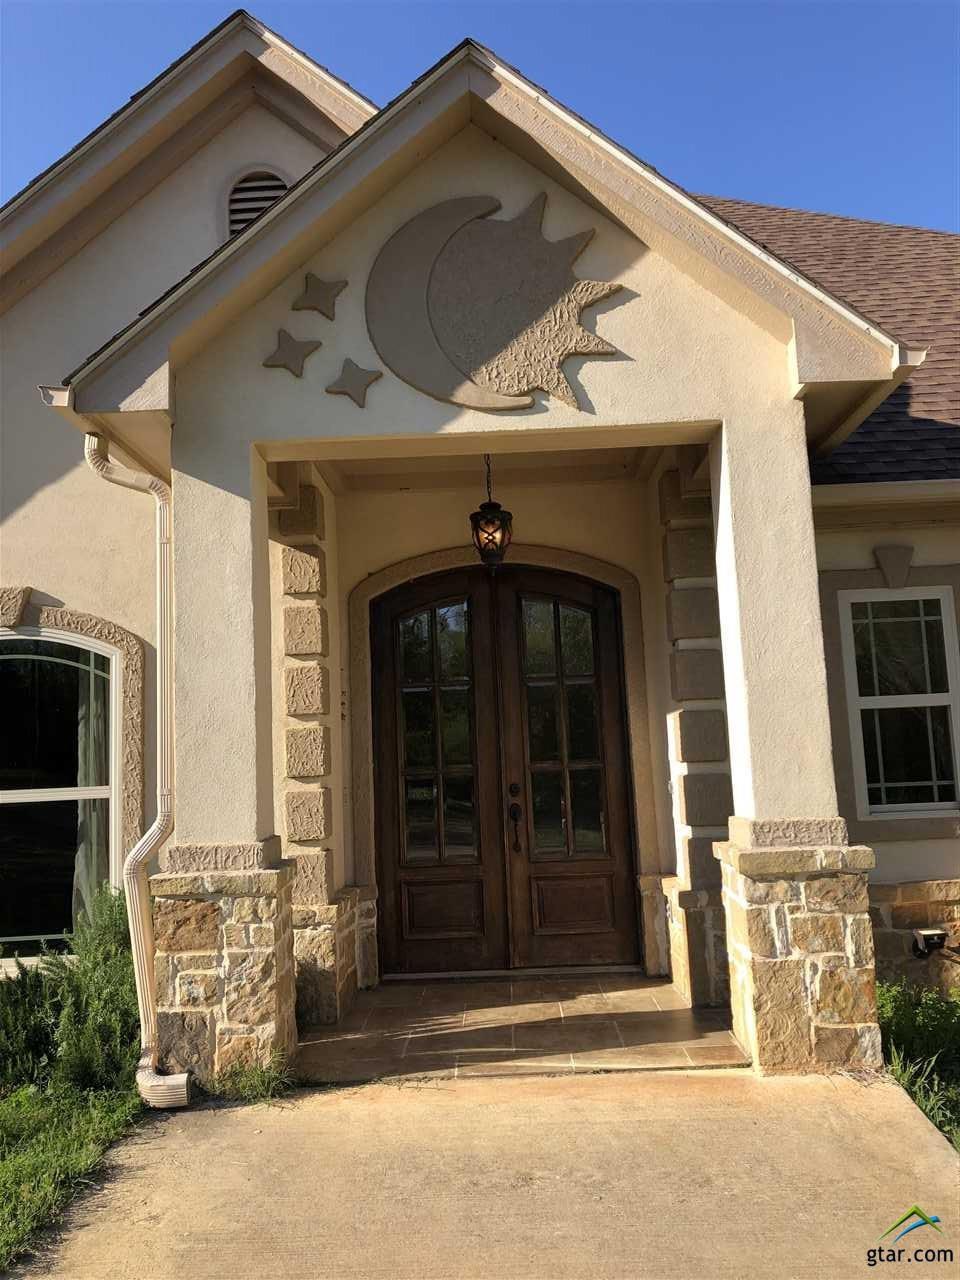 1054 Fairview St, Gladewater, TX 75647 - 4 Bed, 2 Bath Single-Family Home -  MLS #10106845 - 48 Photos   Trulia